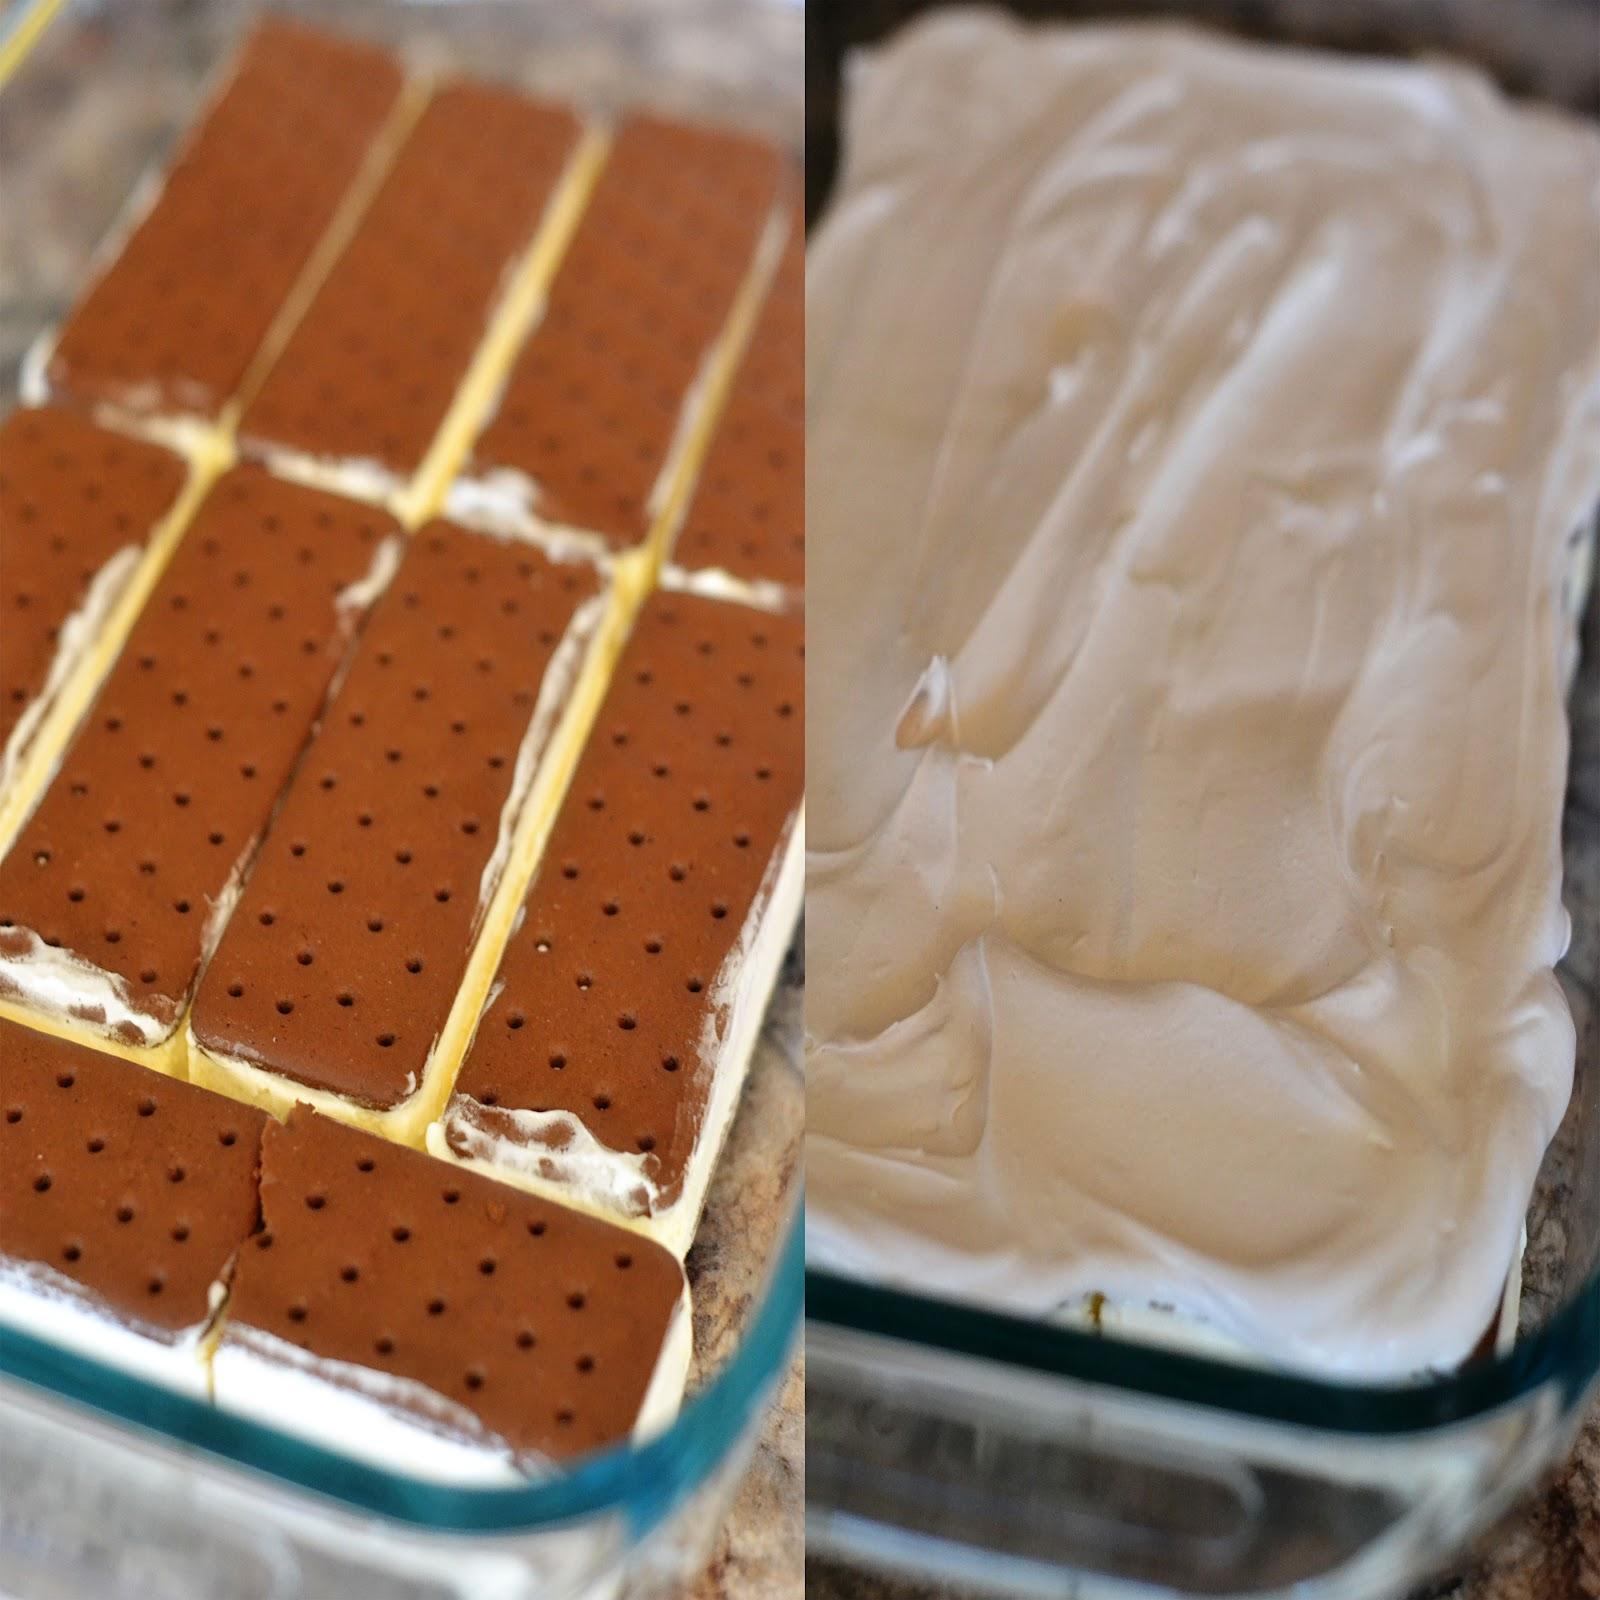 Ice Cream Sandwich Cake Images : Banana Split Ice Cream Sandwich Cake